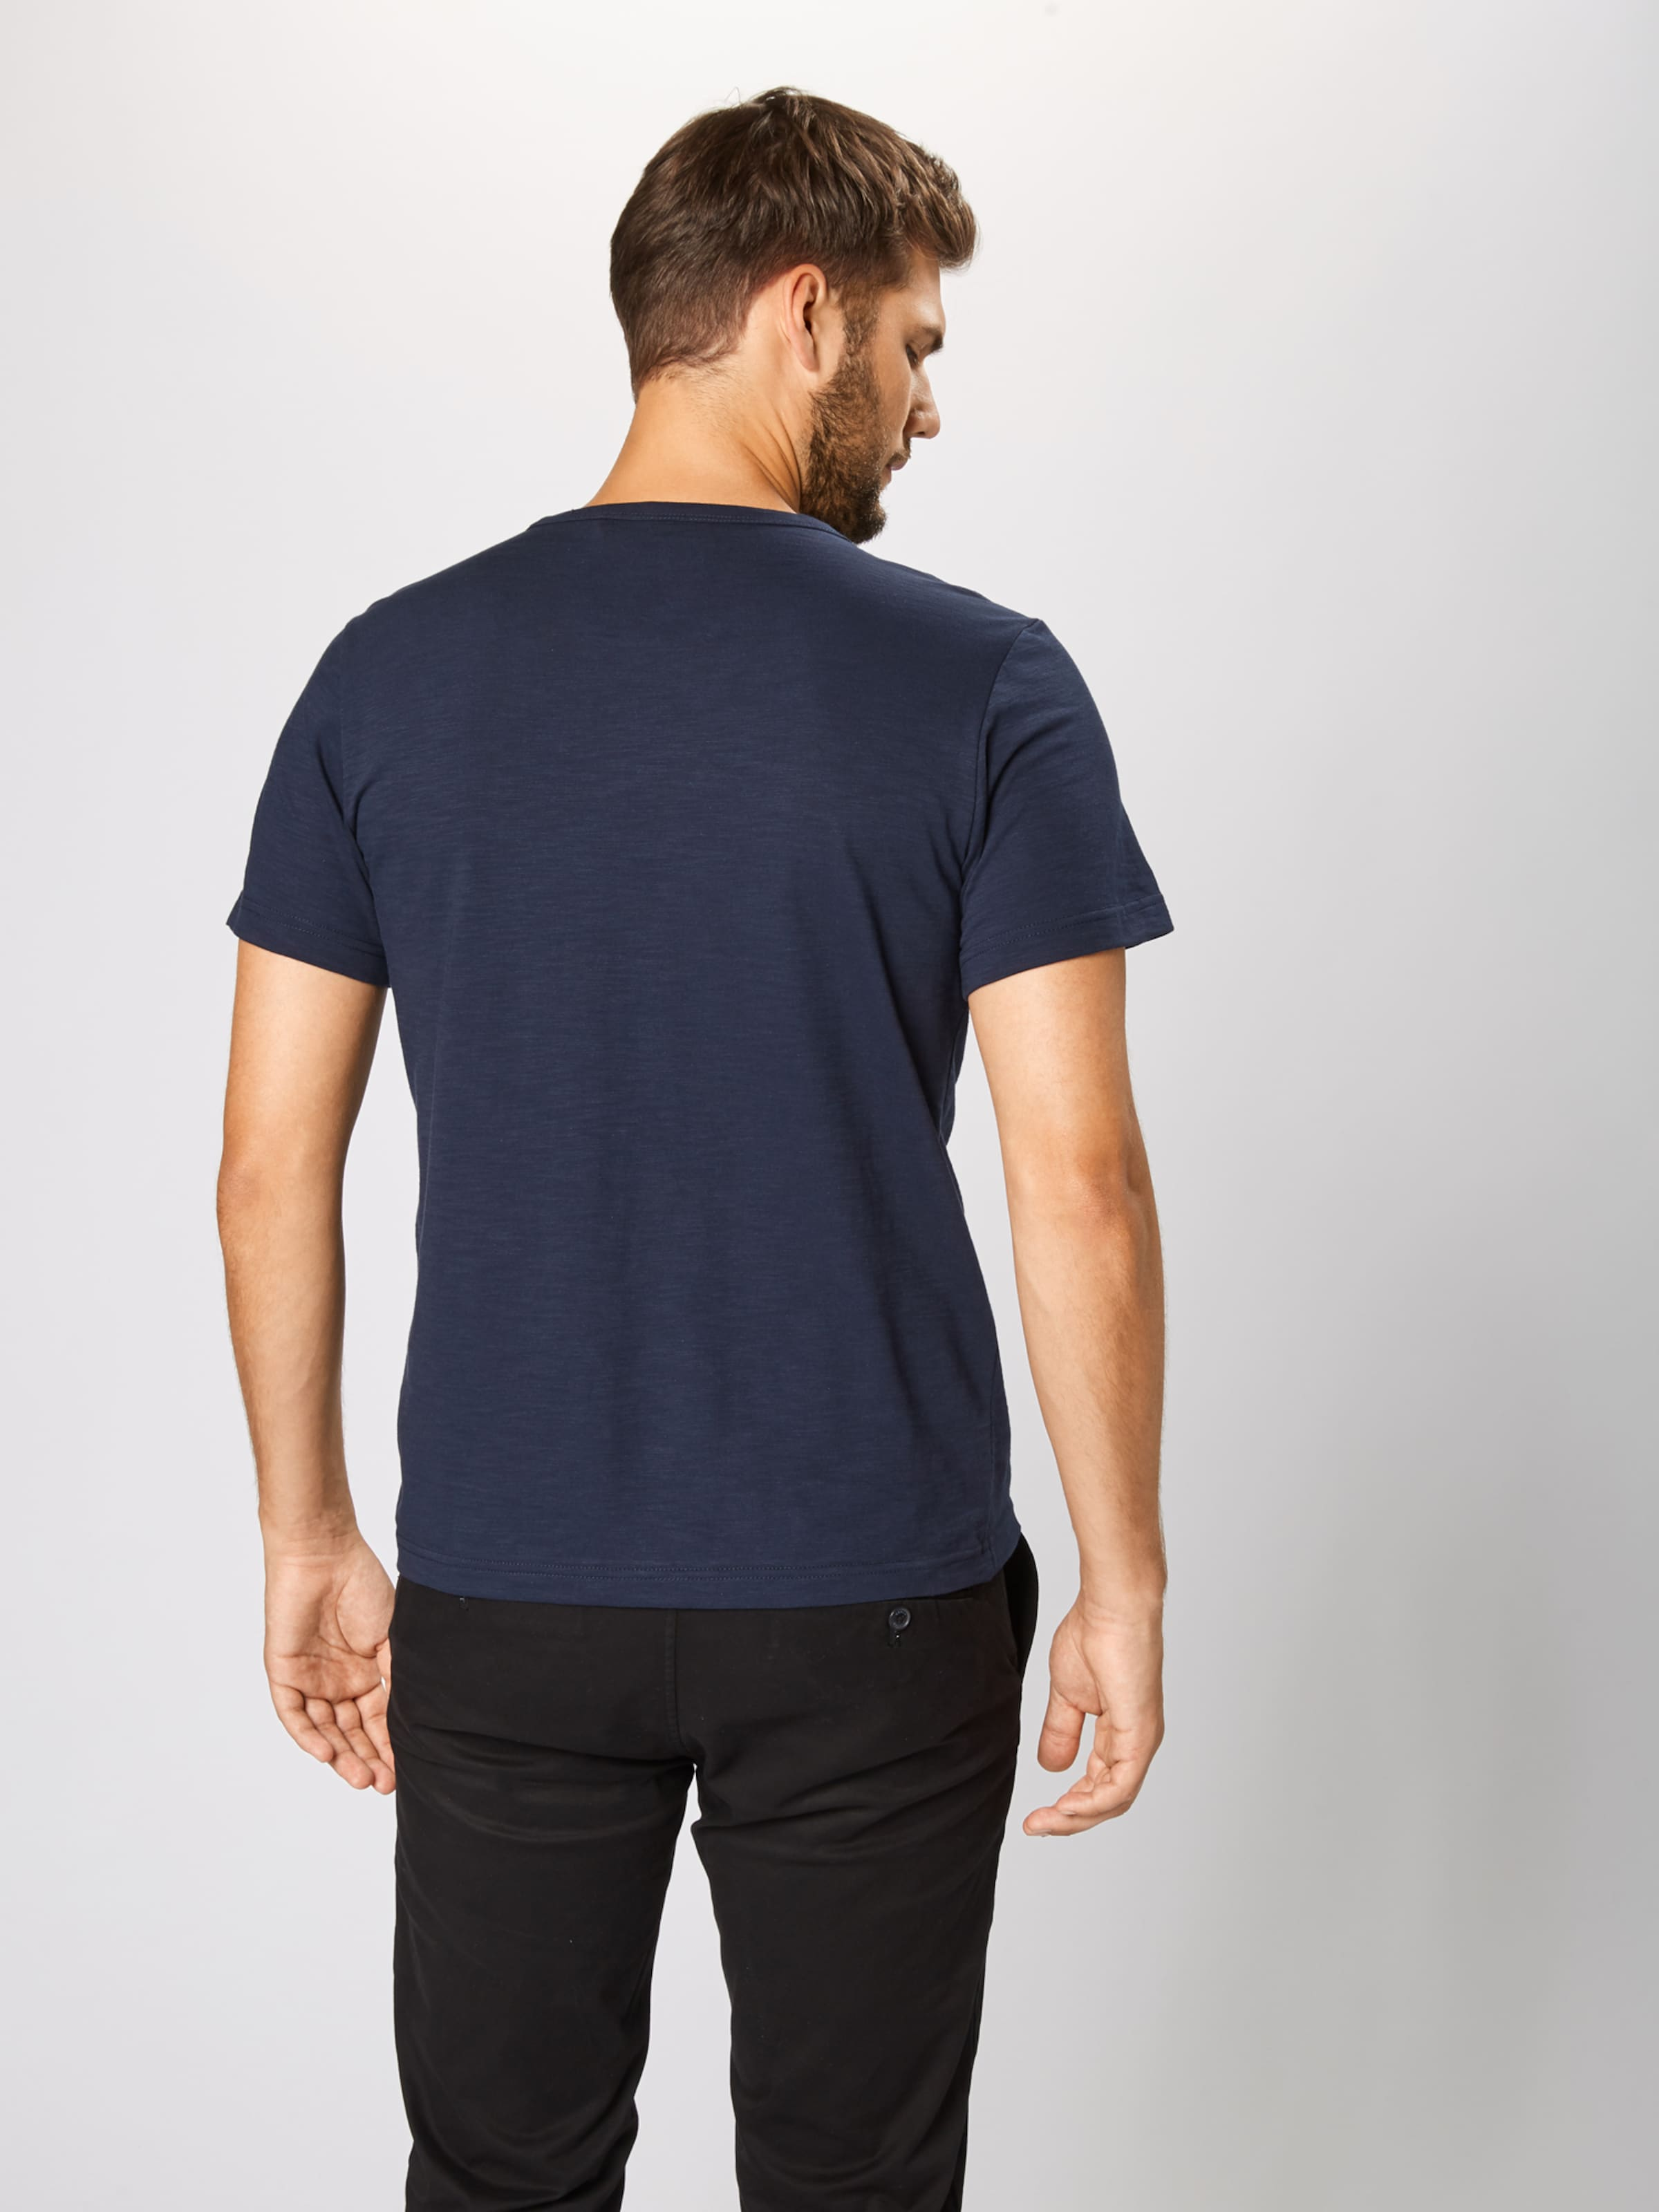 Shirt S Dunkelblau In Dunkelblau S Shirt S oliver oliver In zpMVSqUG